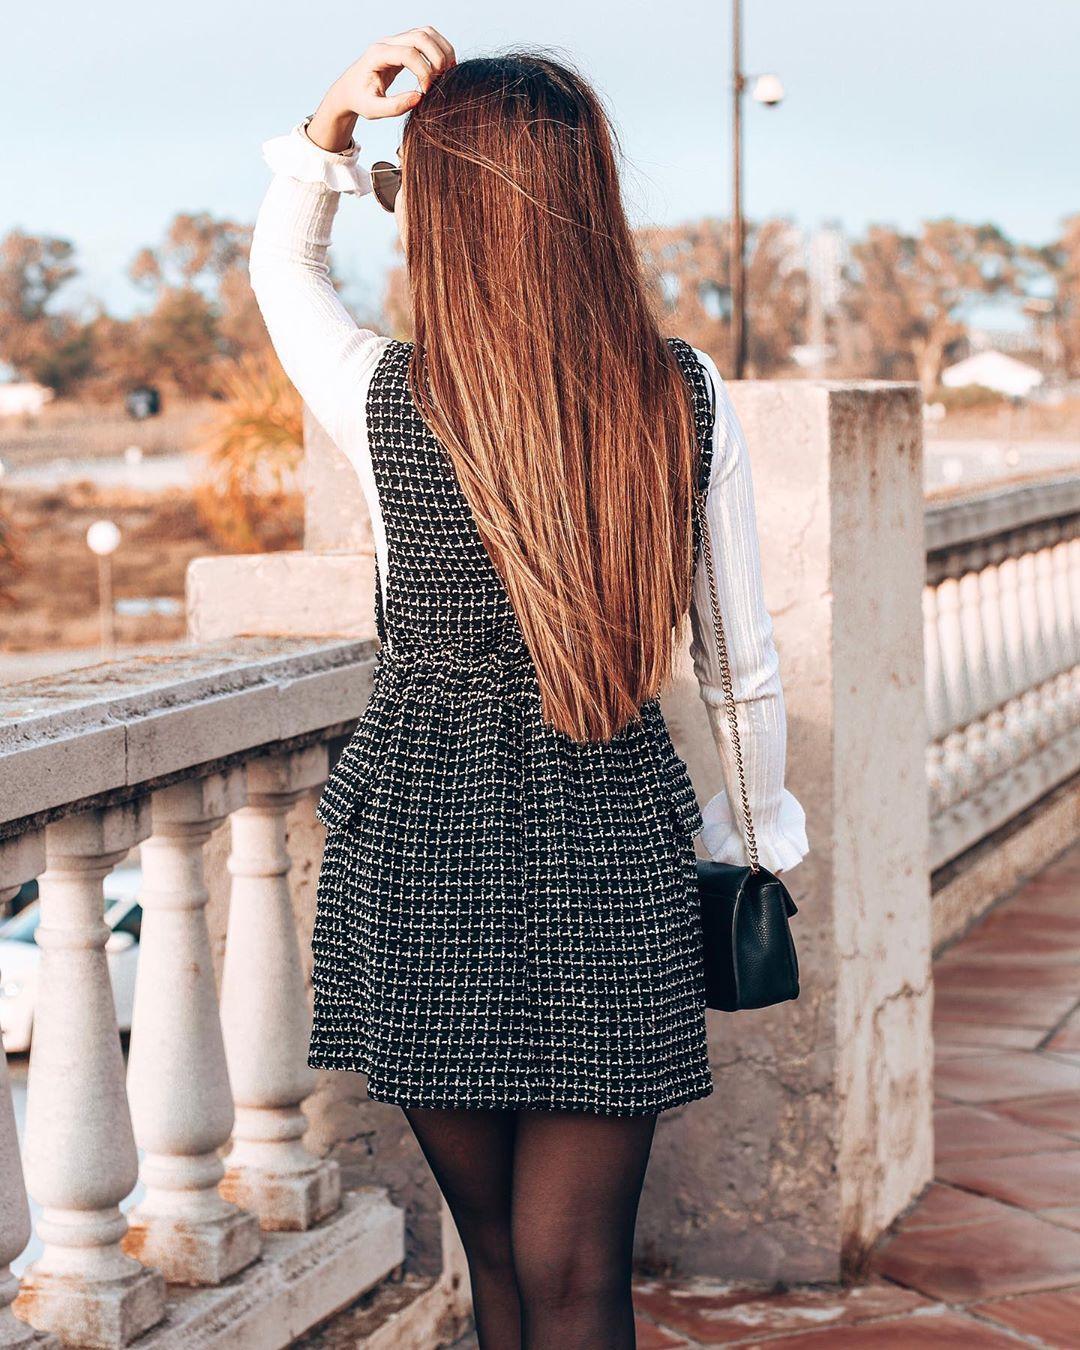 tweed bib overalls dress de Zara sur maricarmencarrionmateo